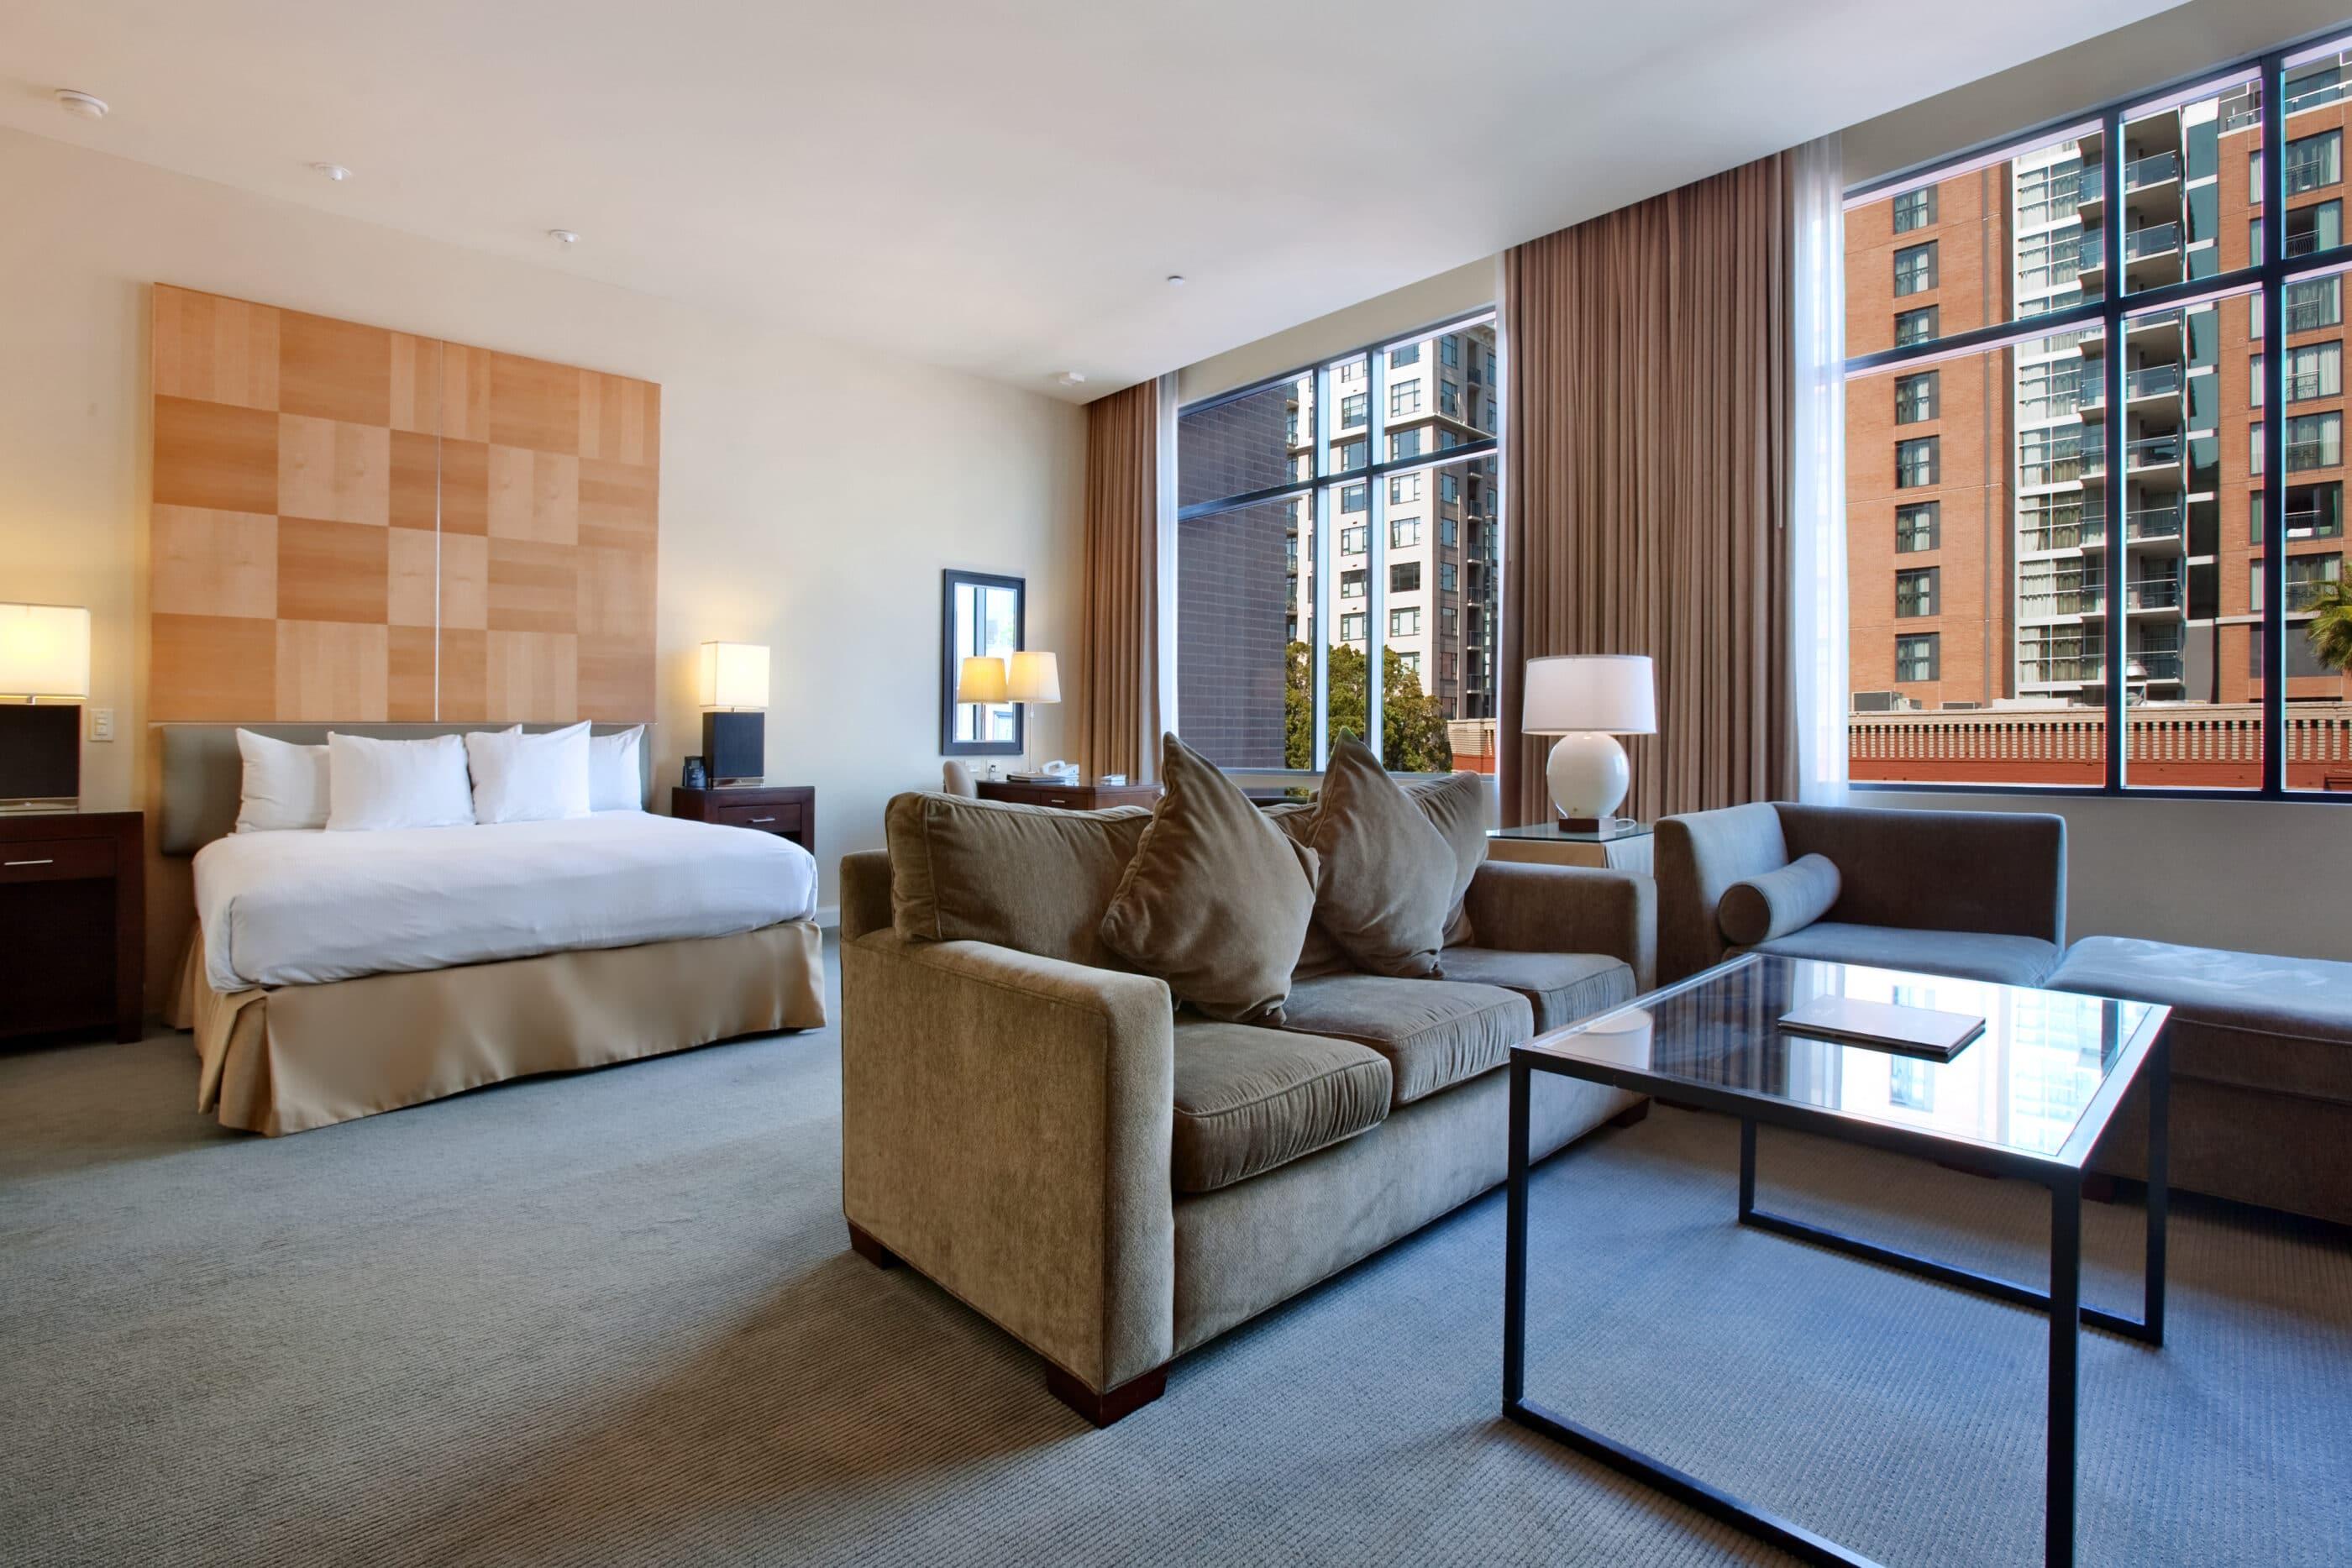 King guest room interior at Hilton San Diego Gaslamp